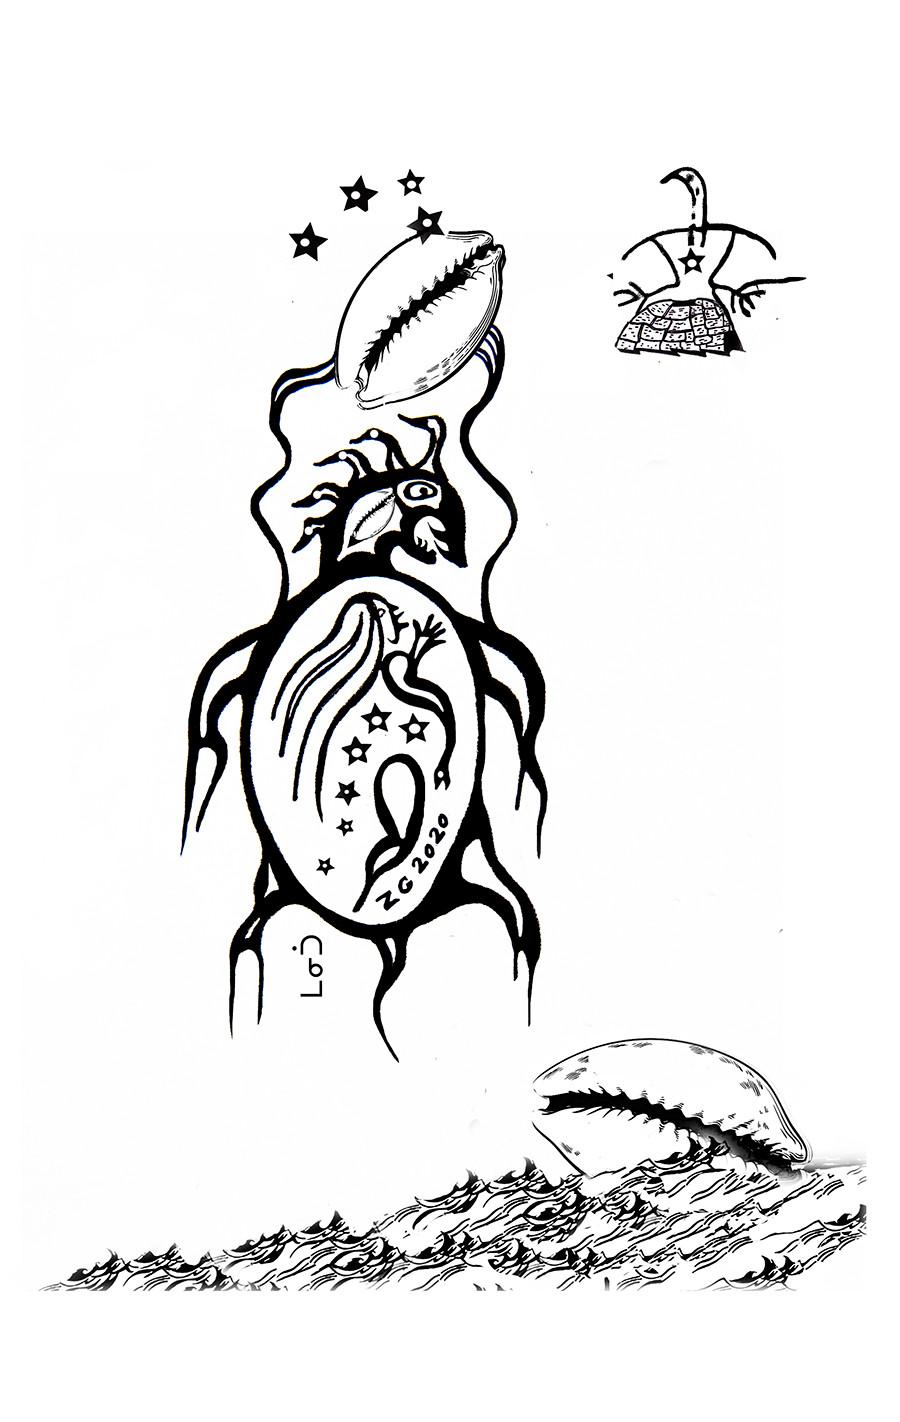 Journey of the Two Spirit Woman by Zhaawano Giizhik